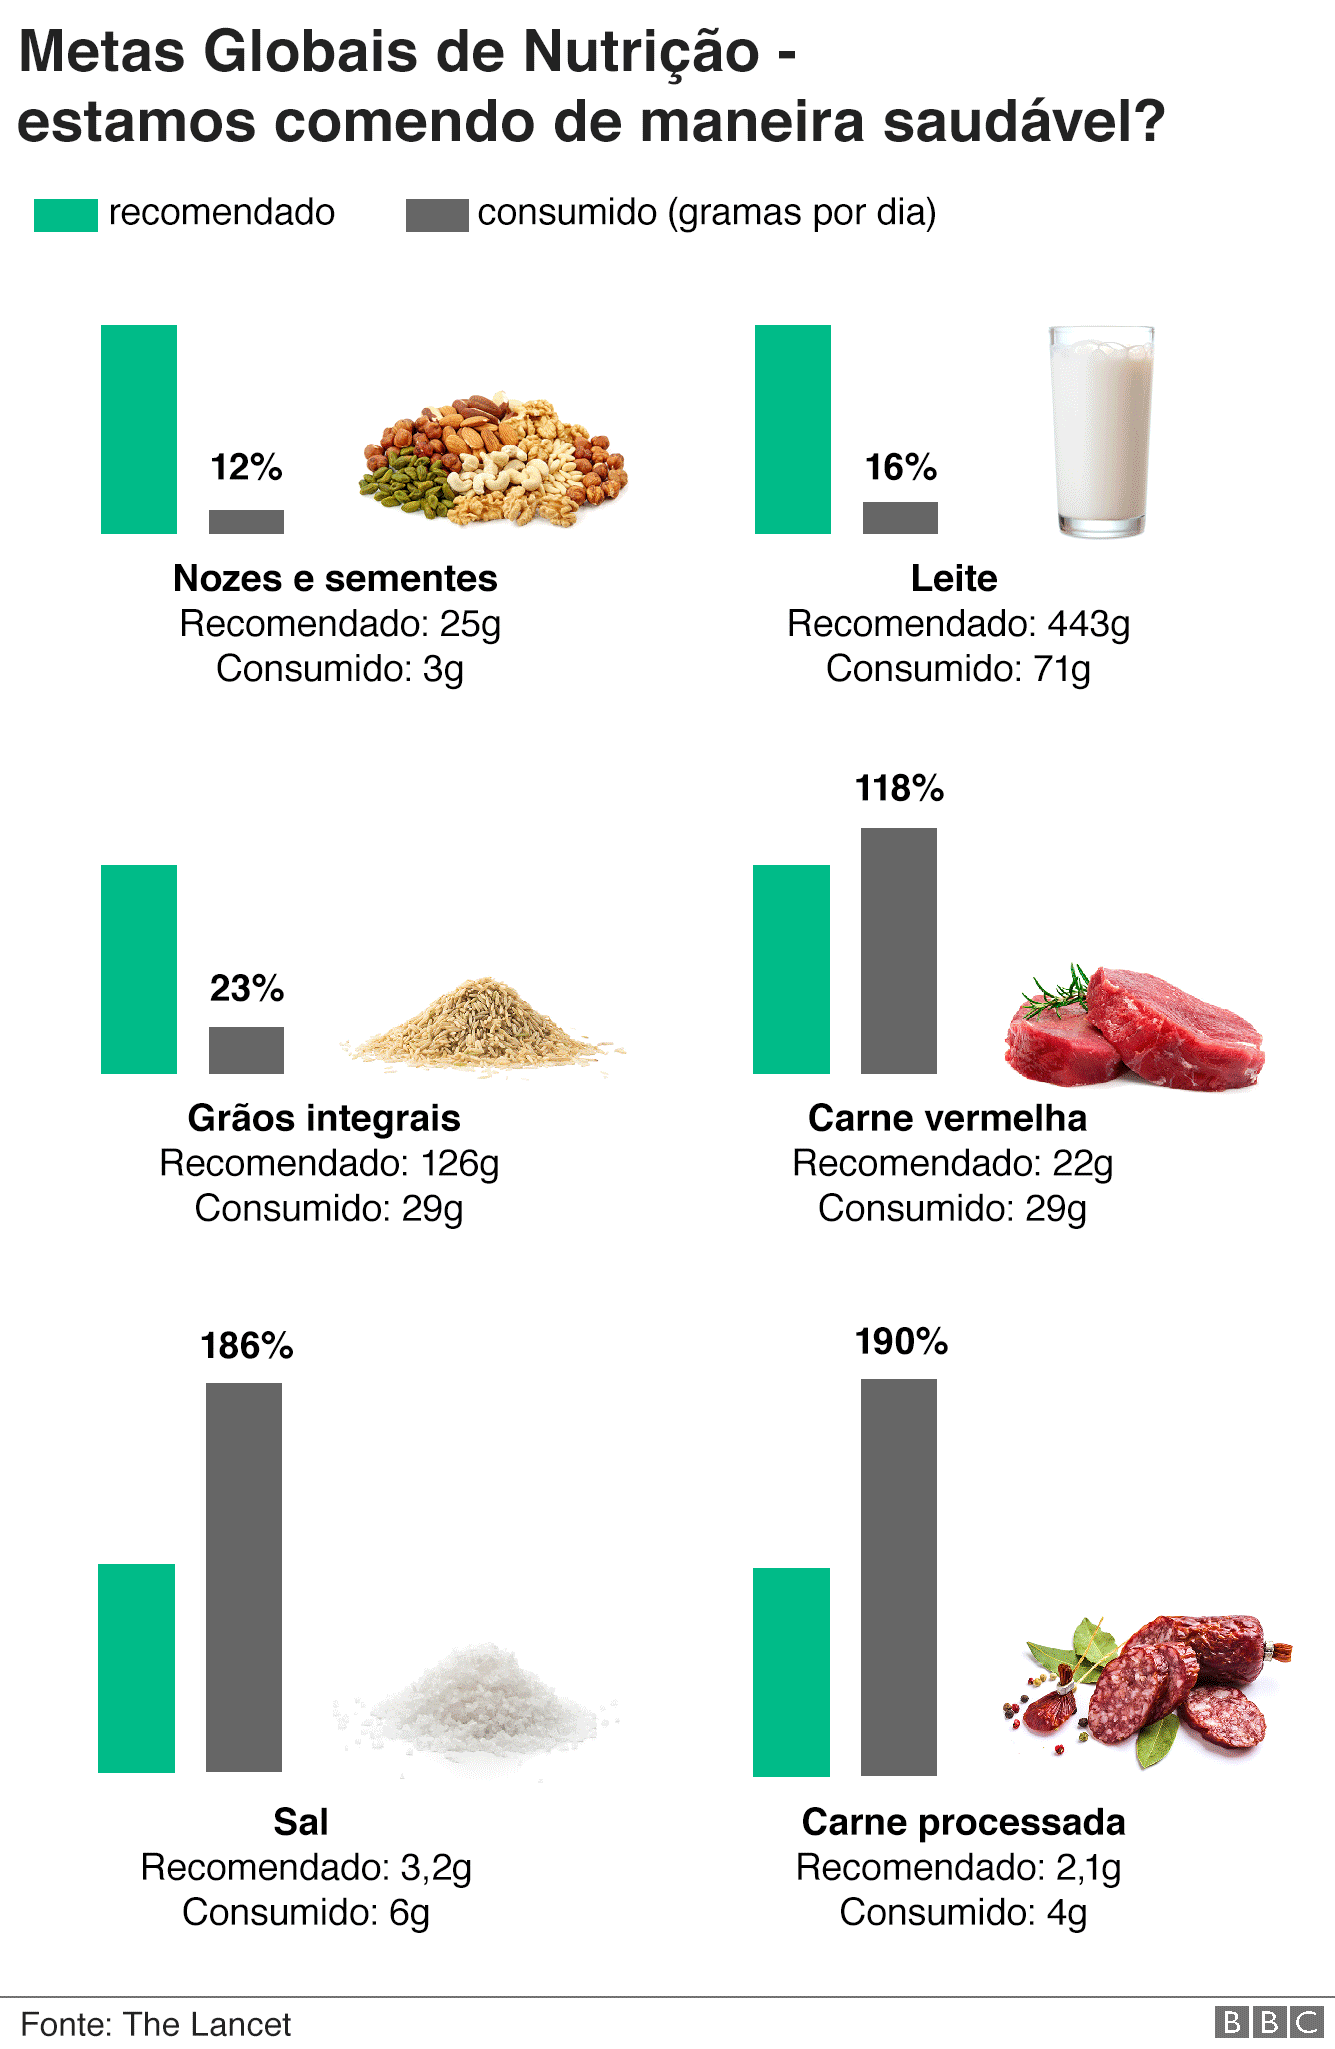 Gráfico sobre dieta no mundo